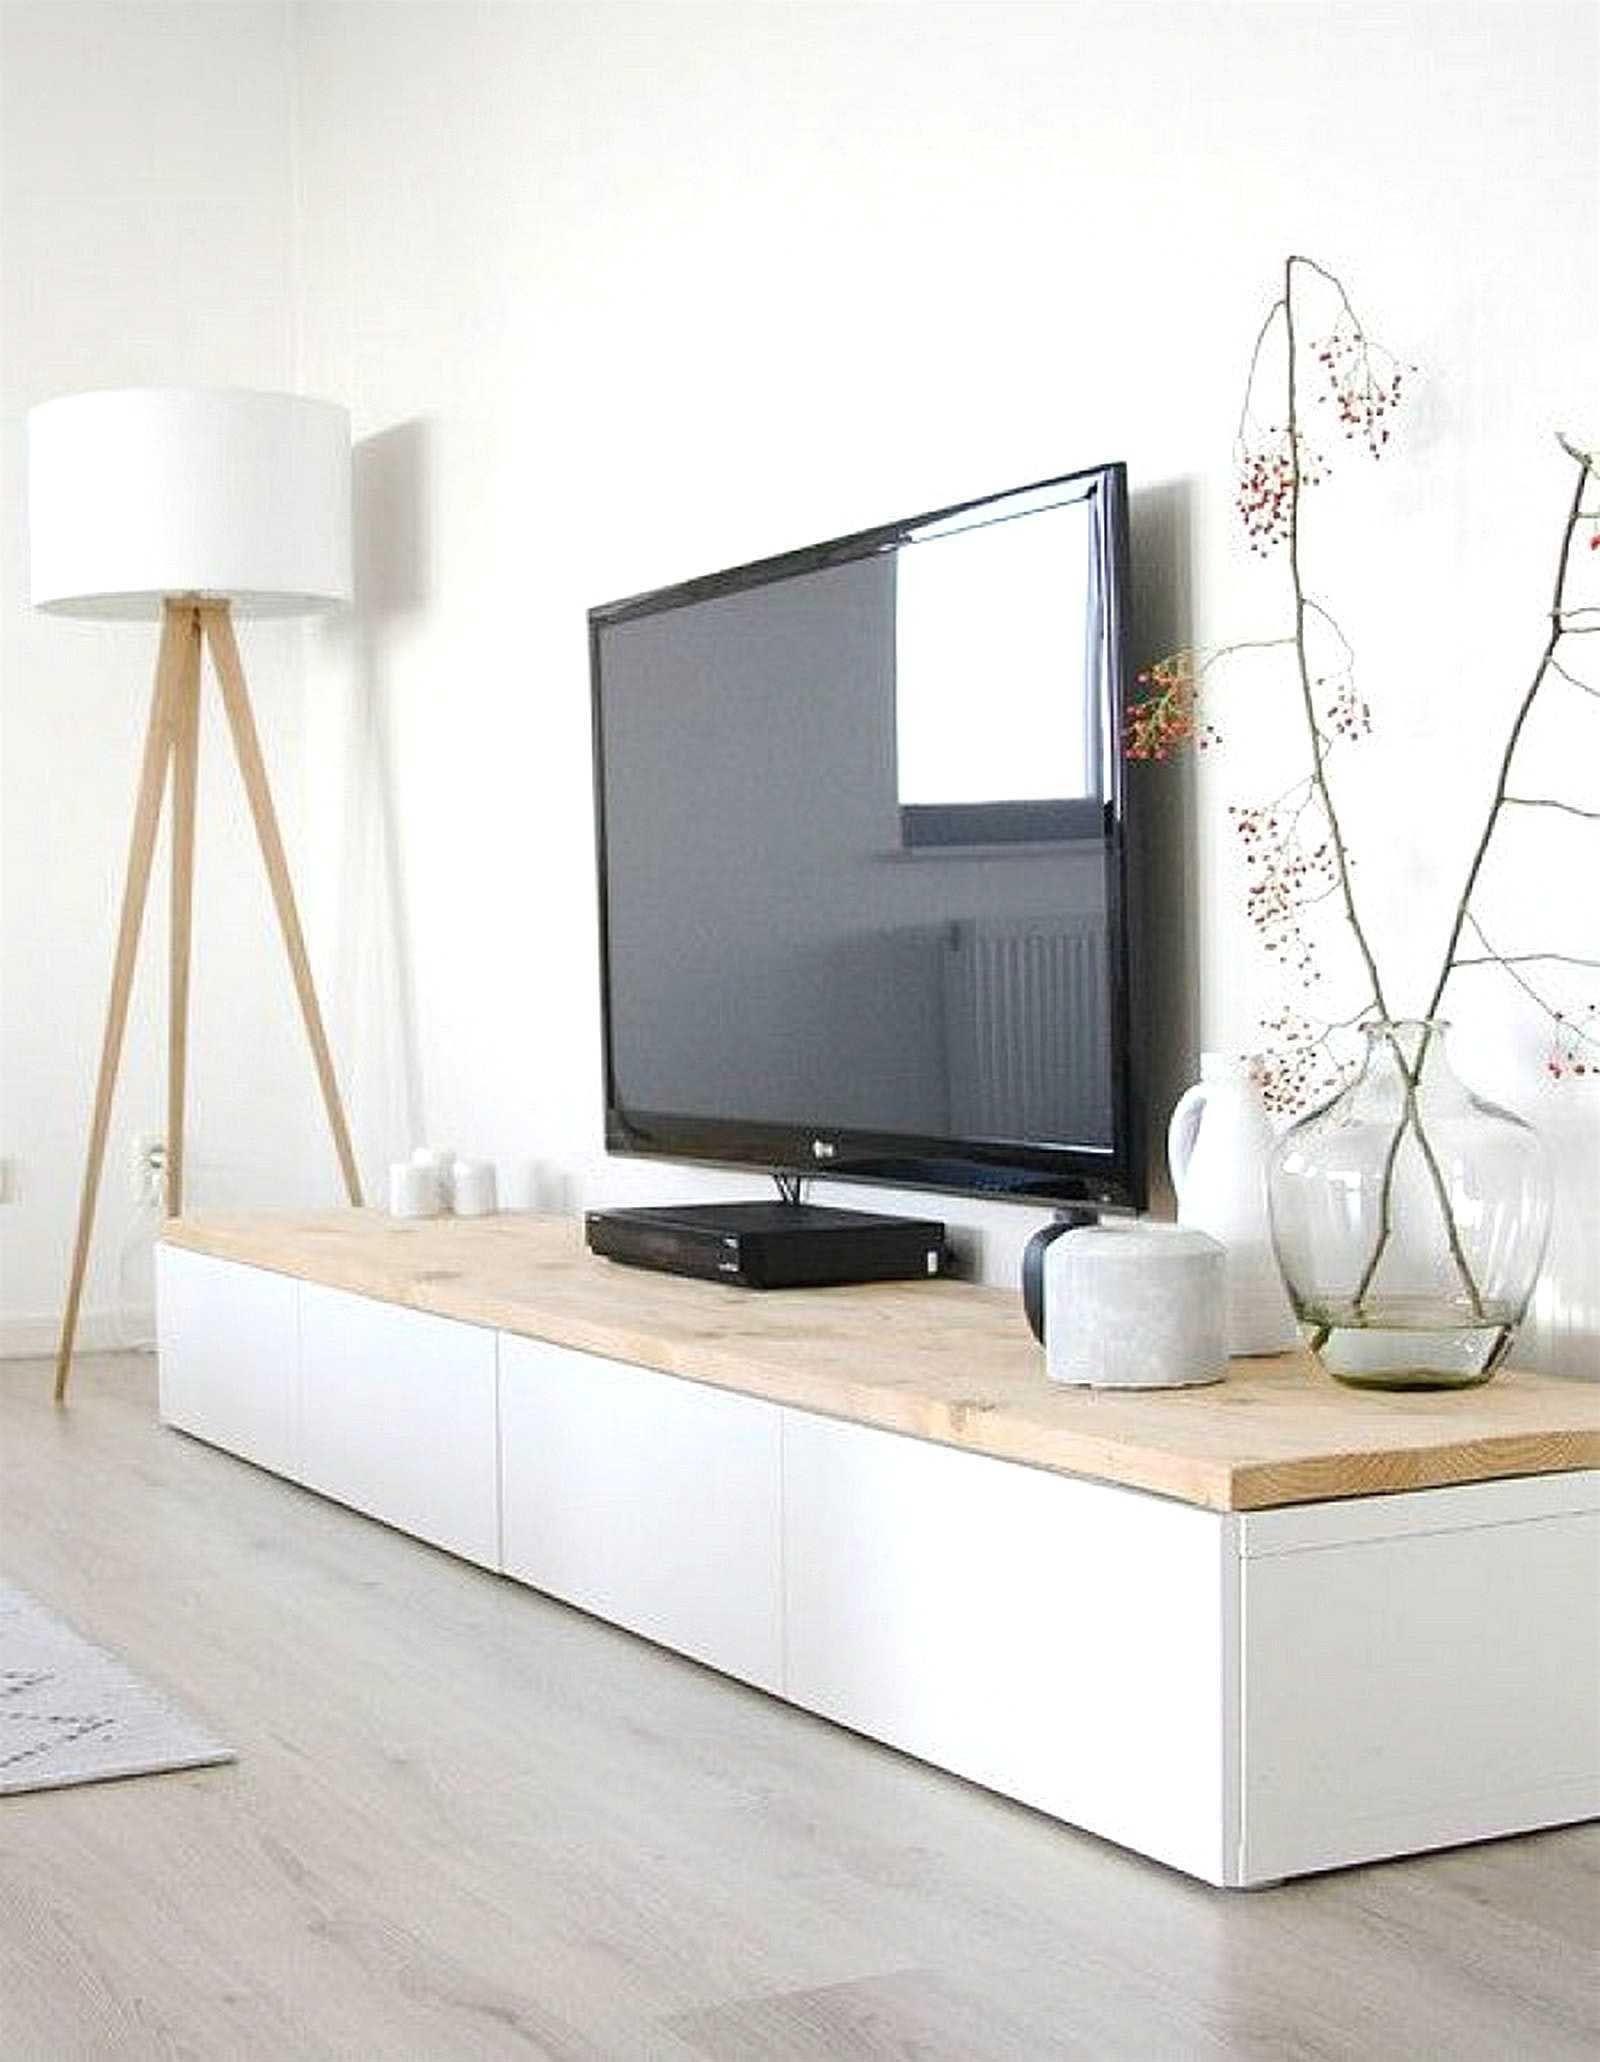 Meuble Tv Suspendu Blanc 100 Concept Meuble Tv Suspendu Blanc Et